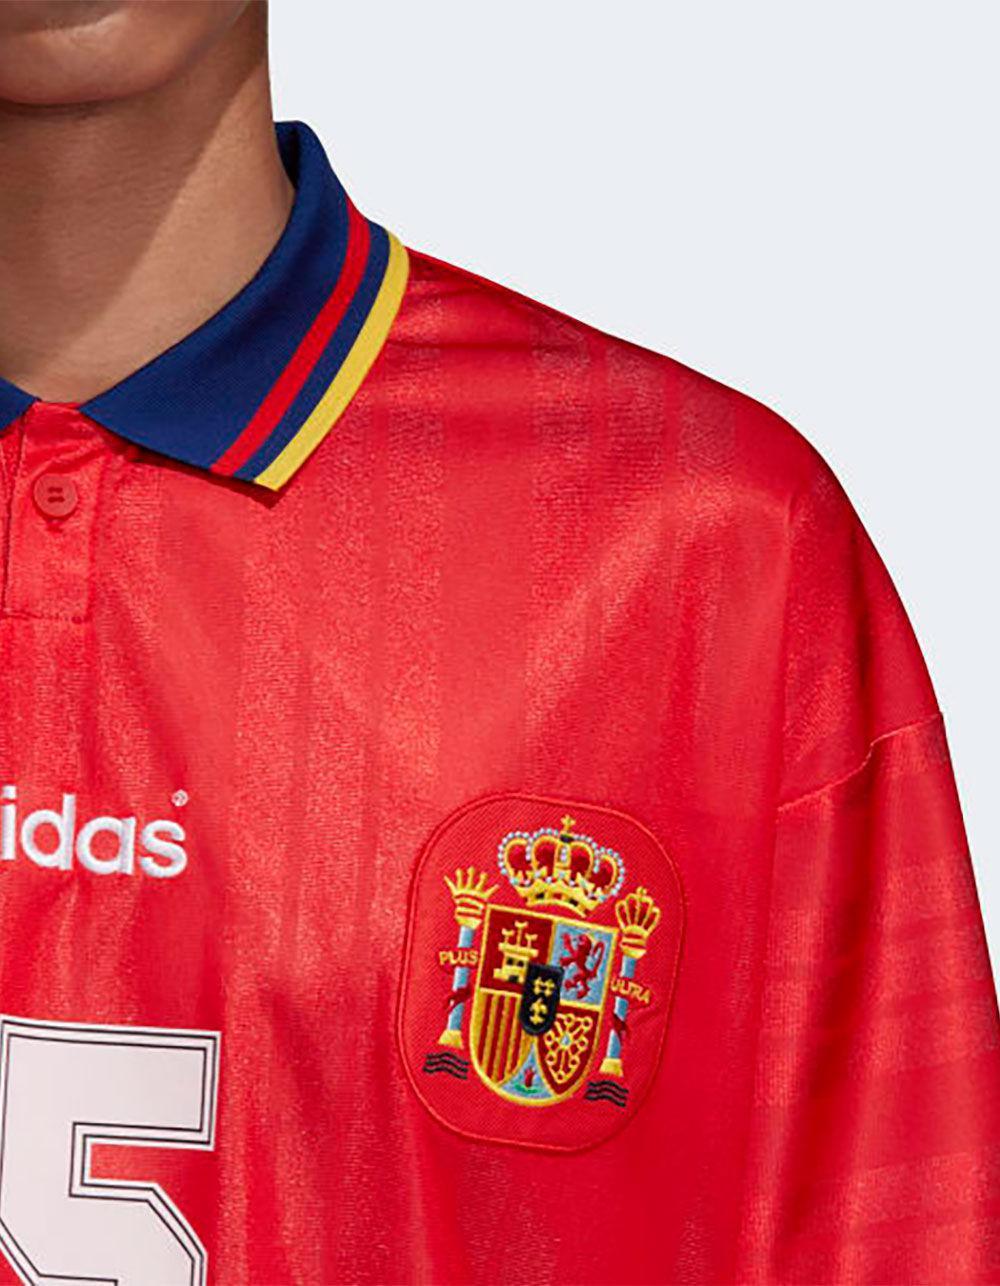 de482cdd6 Lyst - adidas Originals Spain Mens Jersey in Red for Men